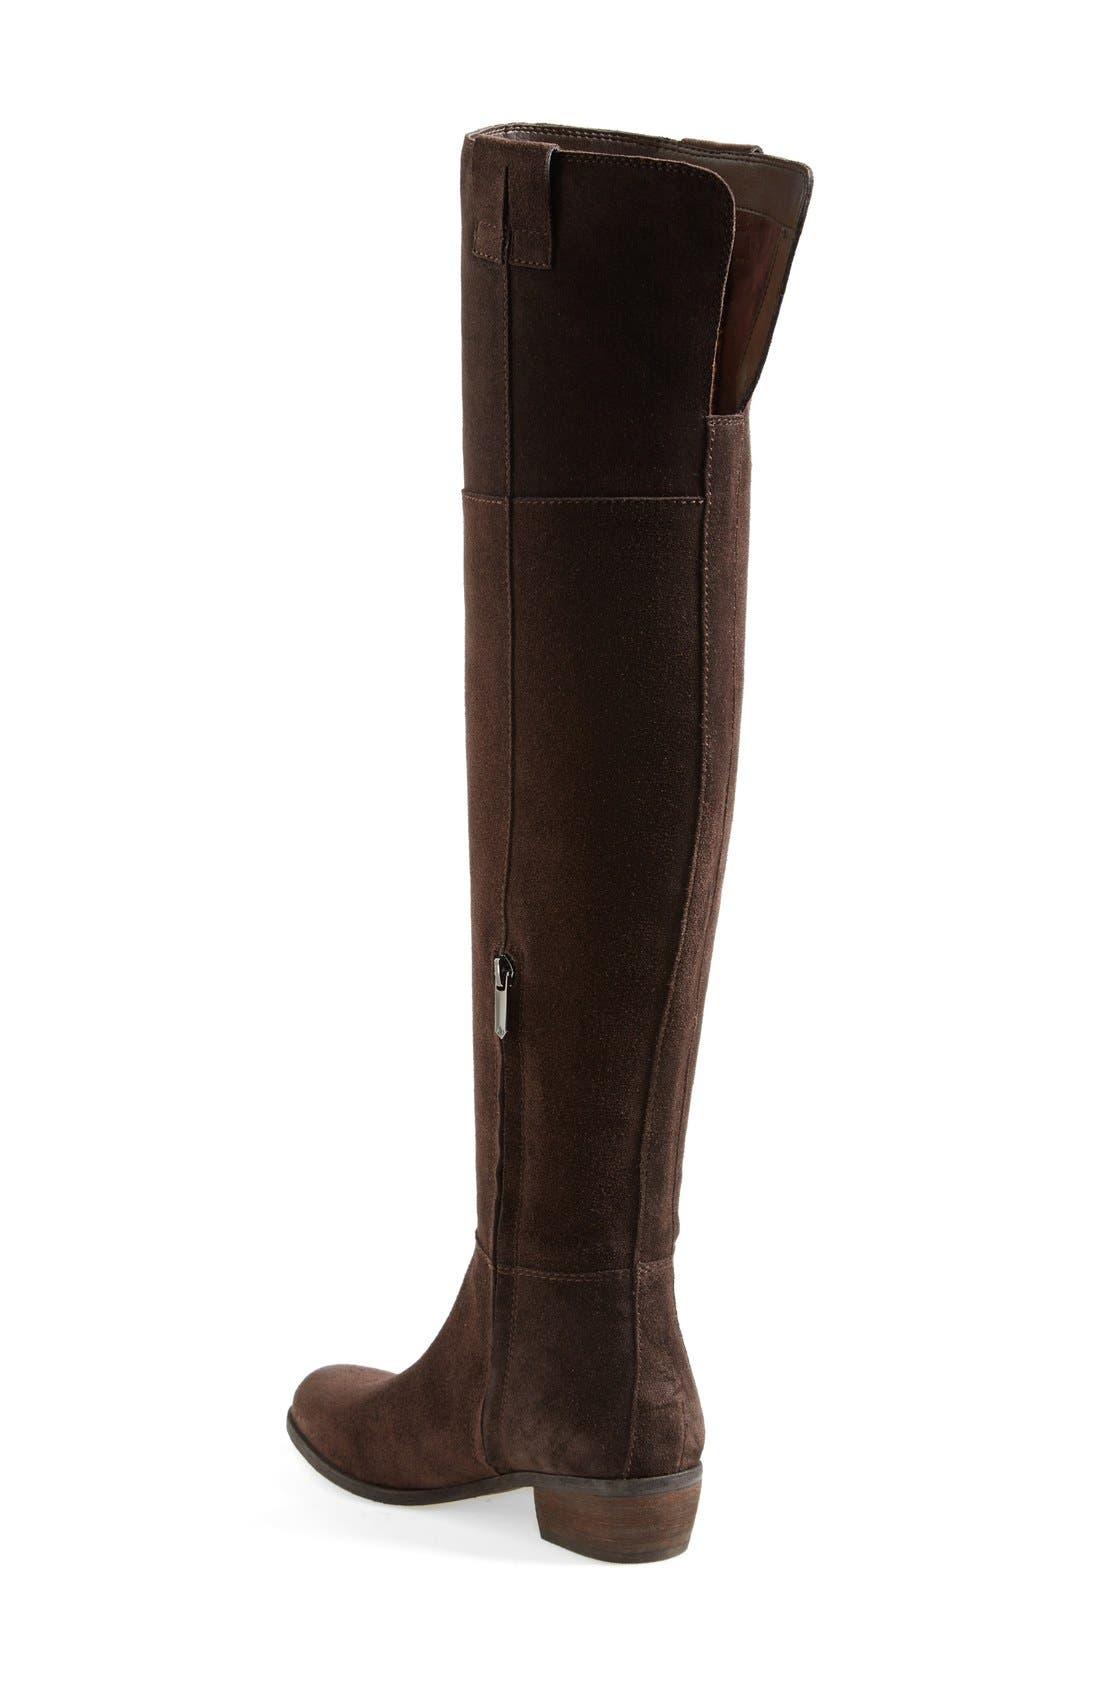 Alternate Image 2  - Sam Edelman 'Johanna' Over the Knee Suede Boot (Women)